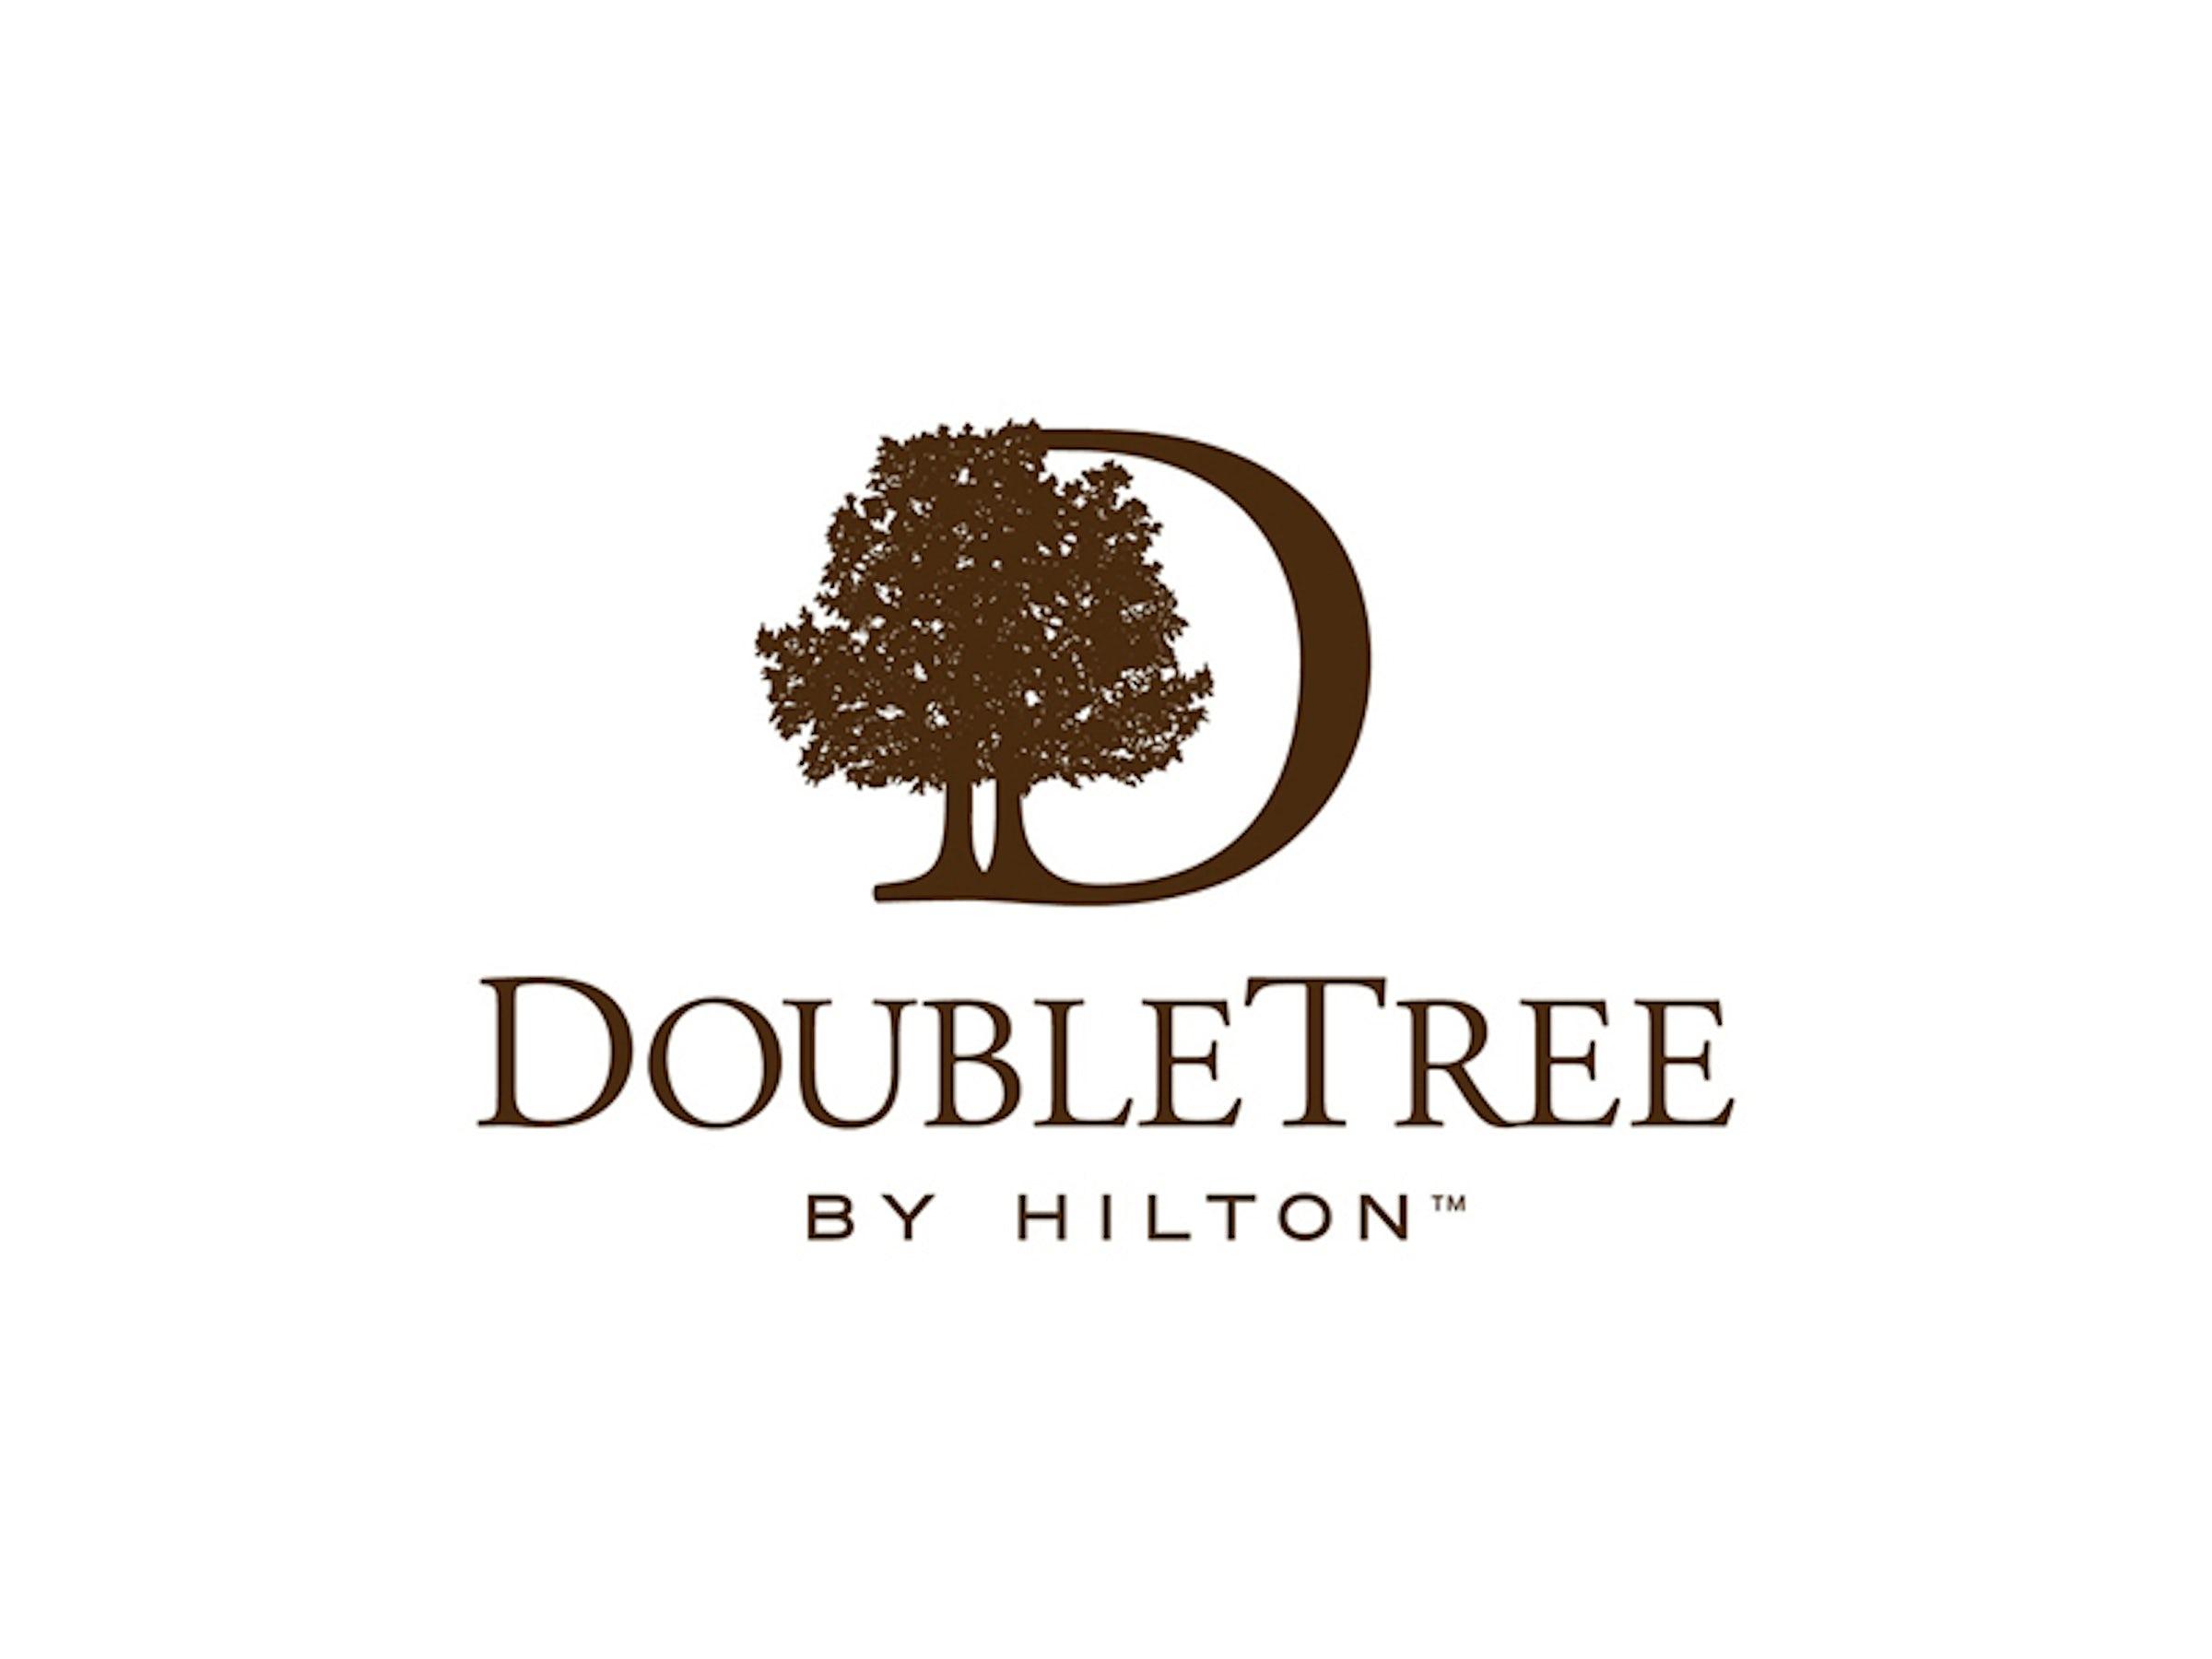 Doubletree by Hilton Dallas Market Center in Beyond Dallas